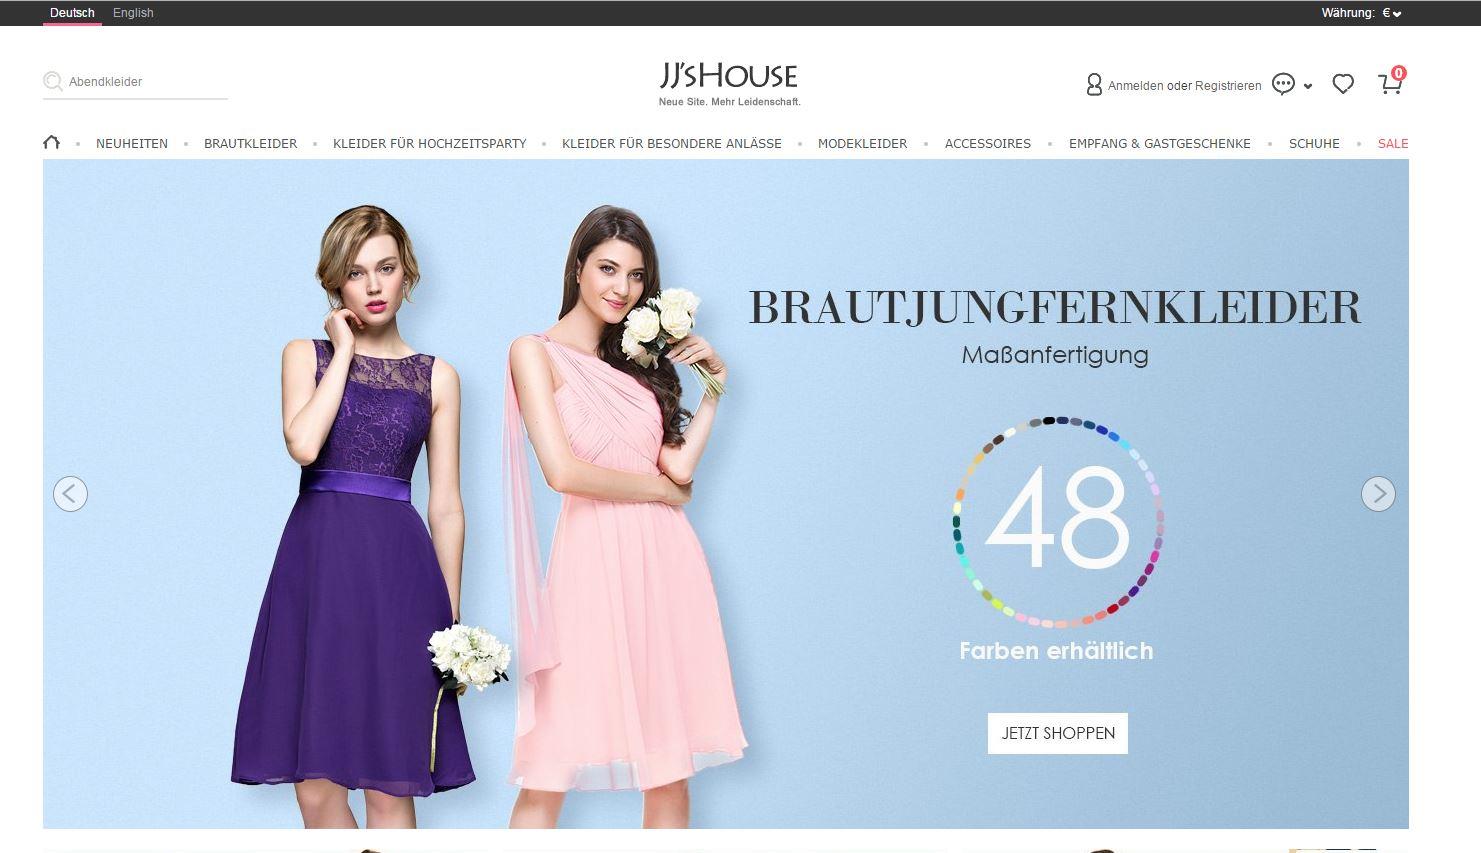 JJsHouse.de